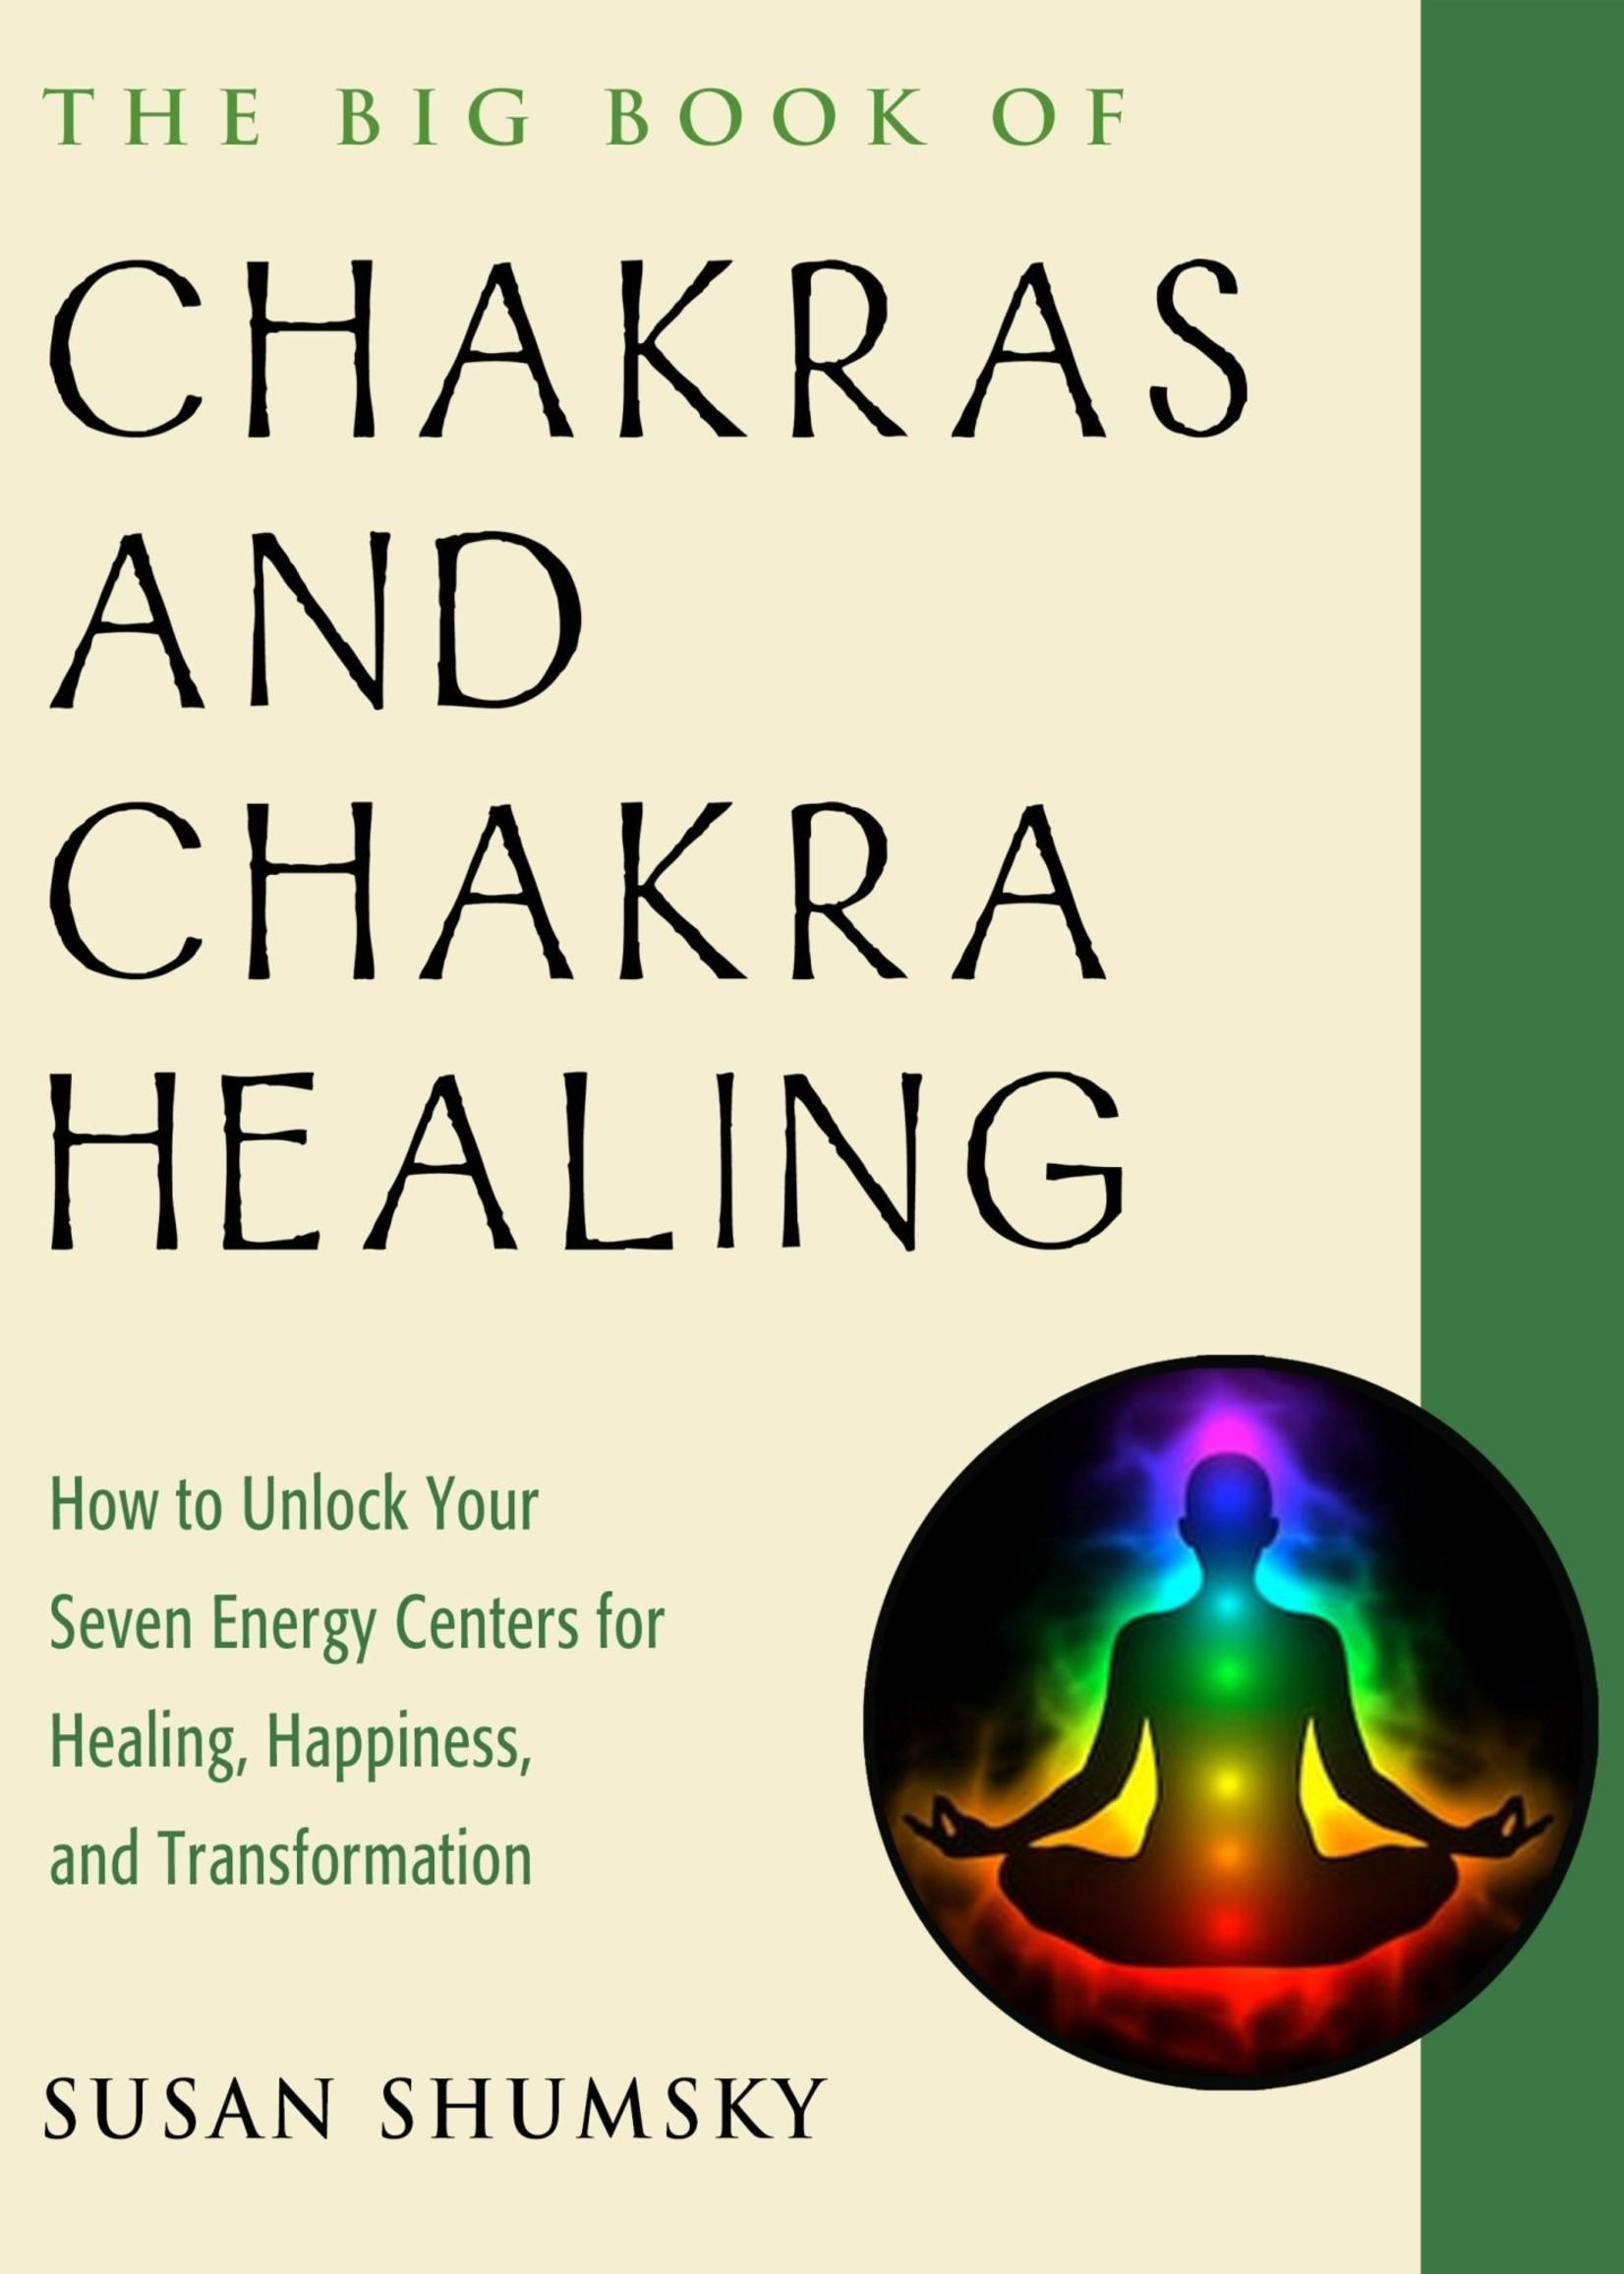 The Big Book of Chakras & Chakra Healing (Susan Shumsky)